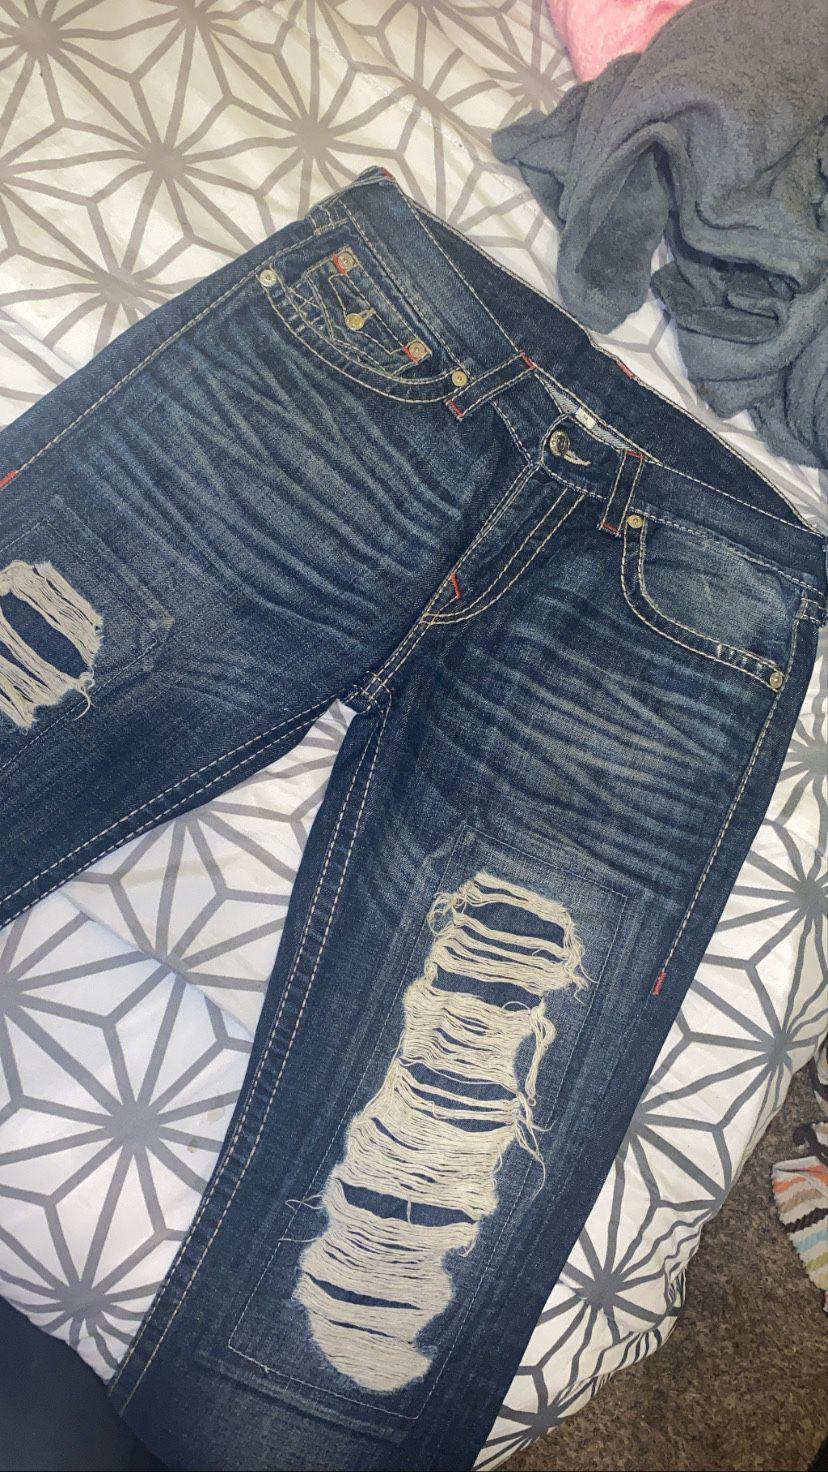 True Religion Jeans&Jacket